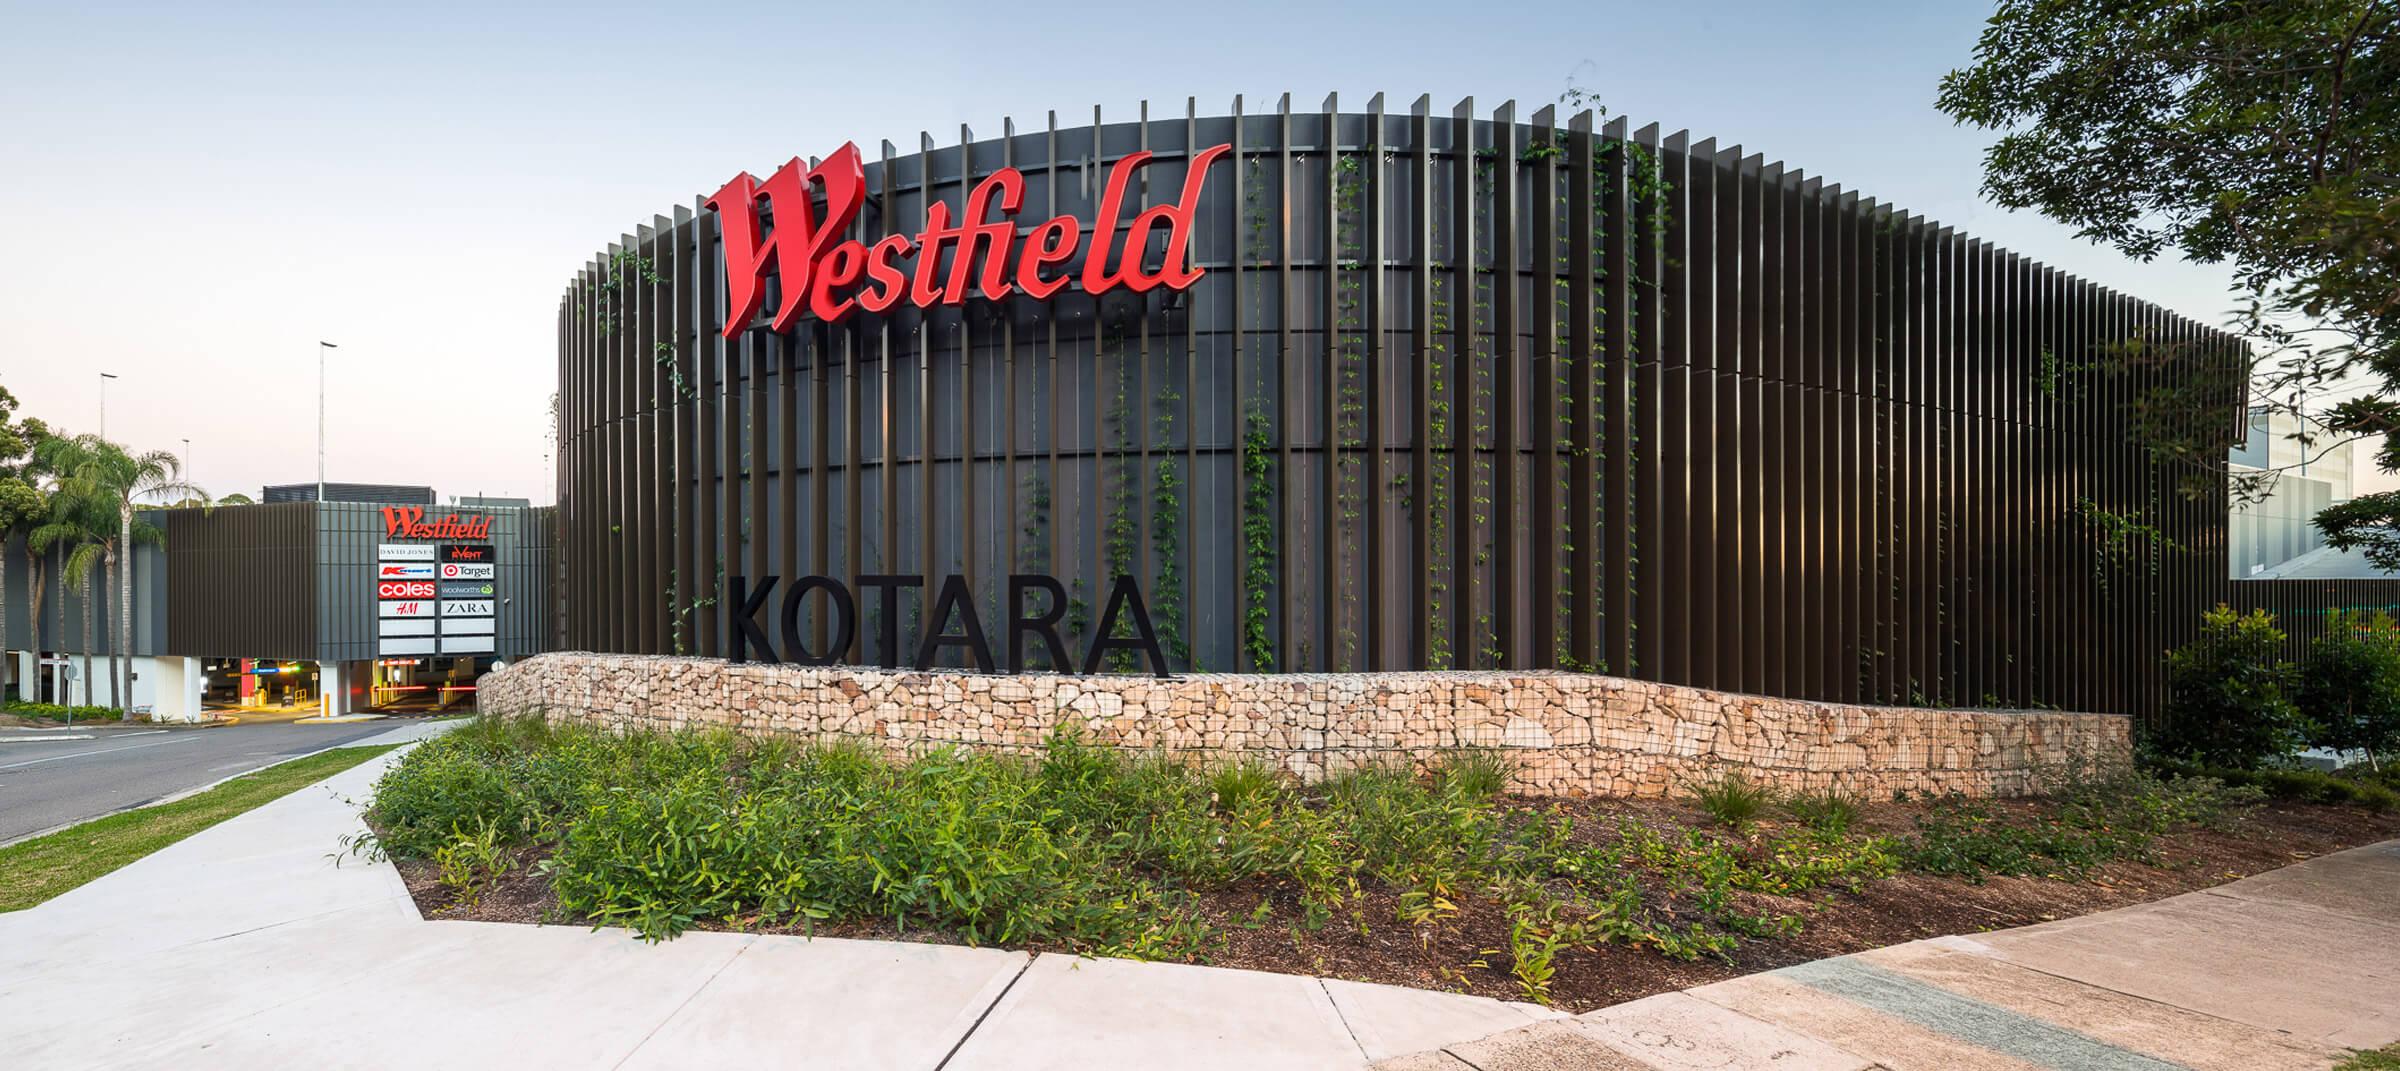 Sculptform Westfield Kotara